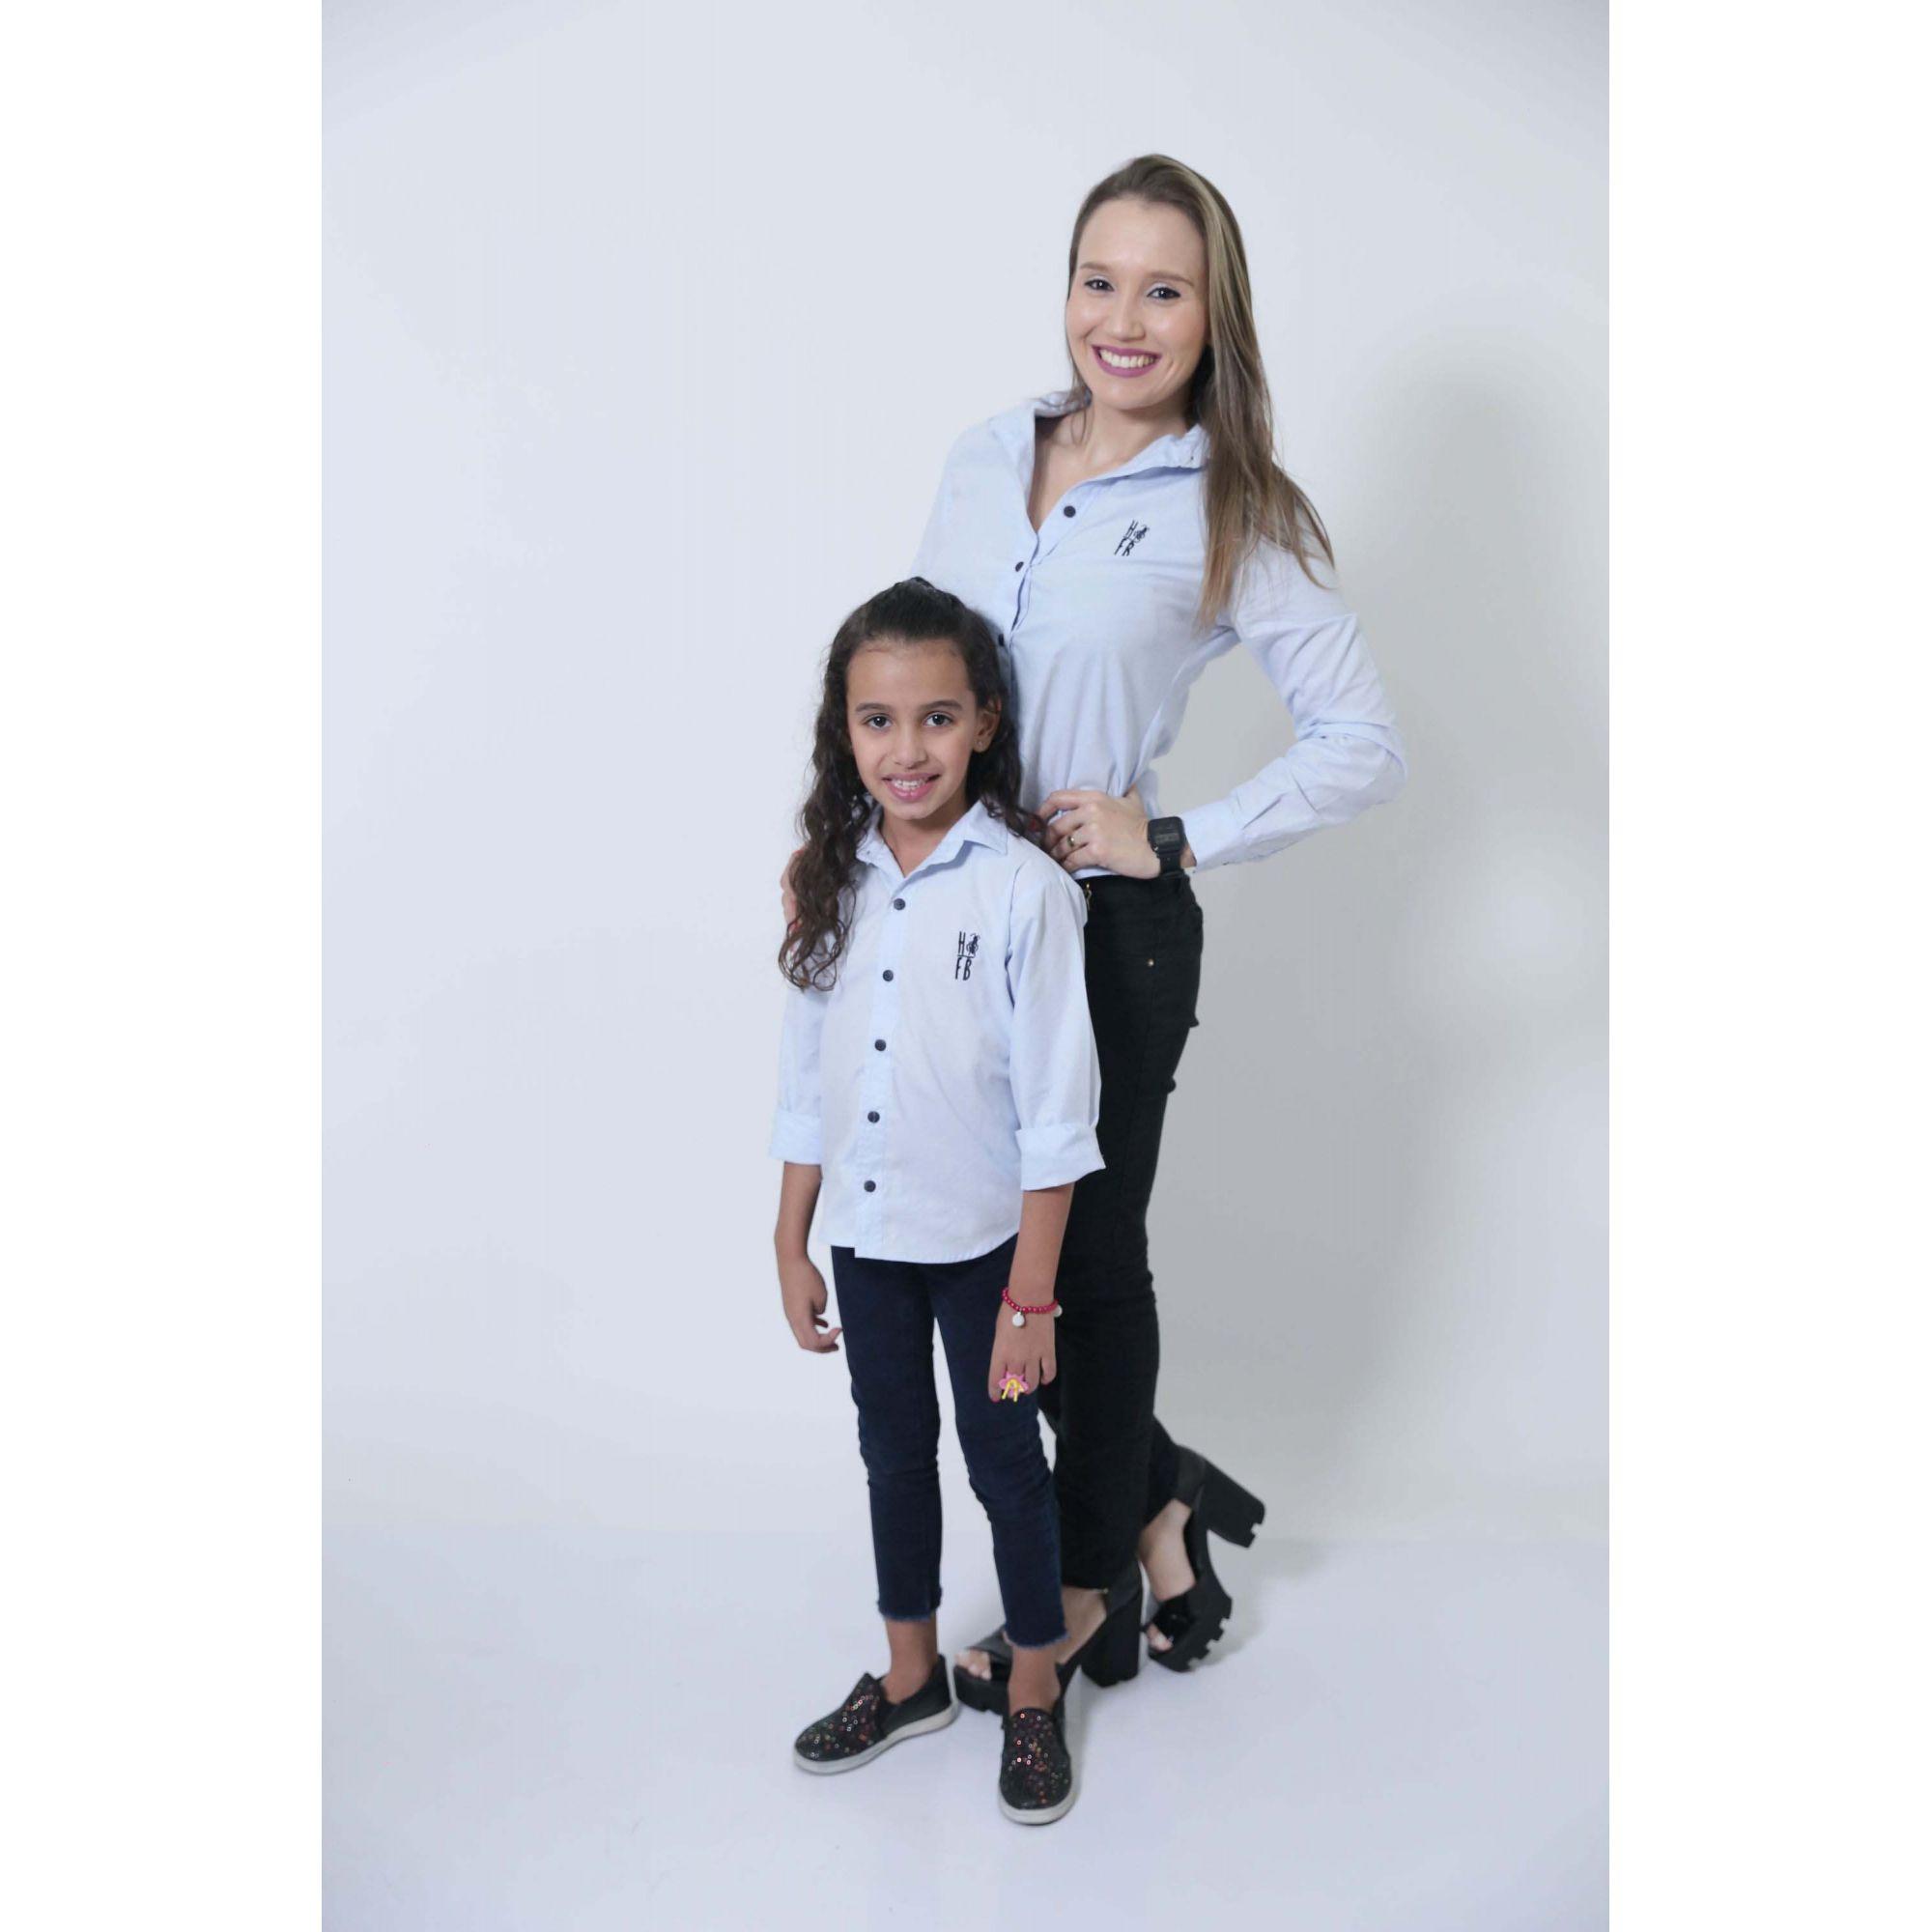 MÃE E FILHOS > Kit 02 Camisas Social Azul Claro Bebê [Coleção Tal Mãe Tal Filho]  - Heitor Fashion Brazil